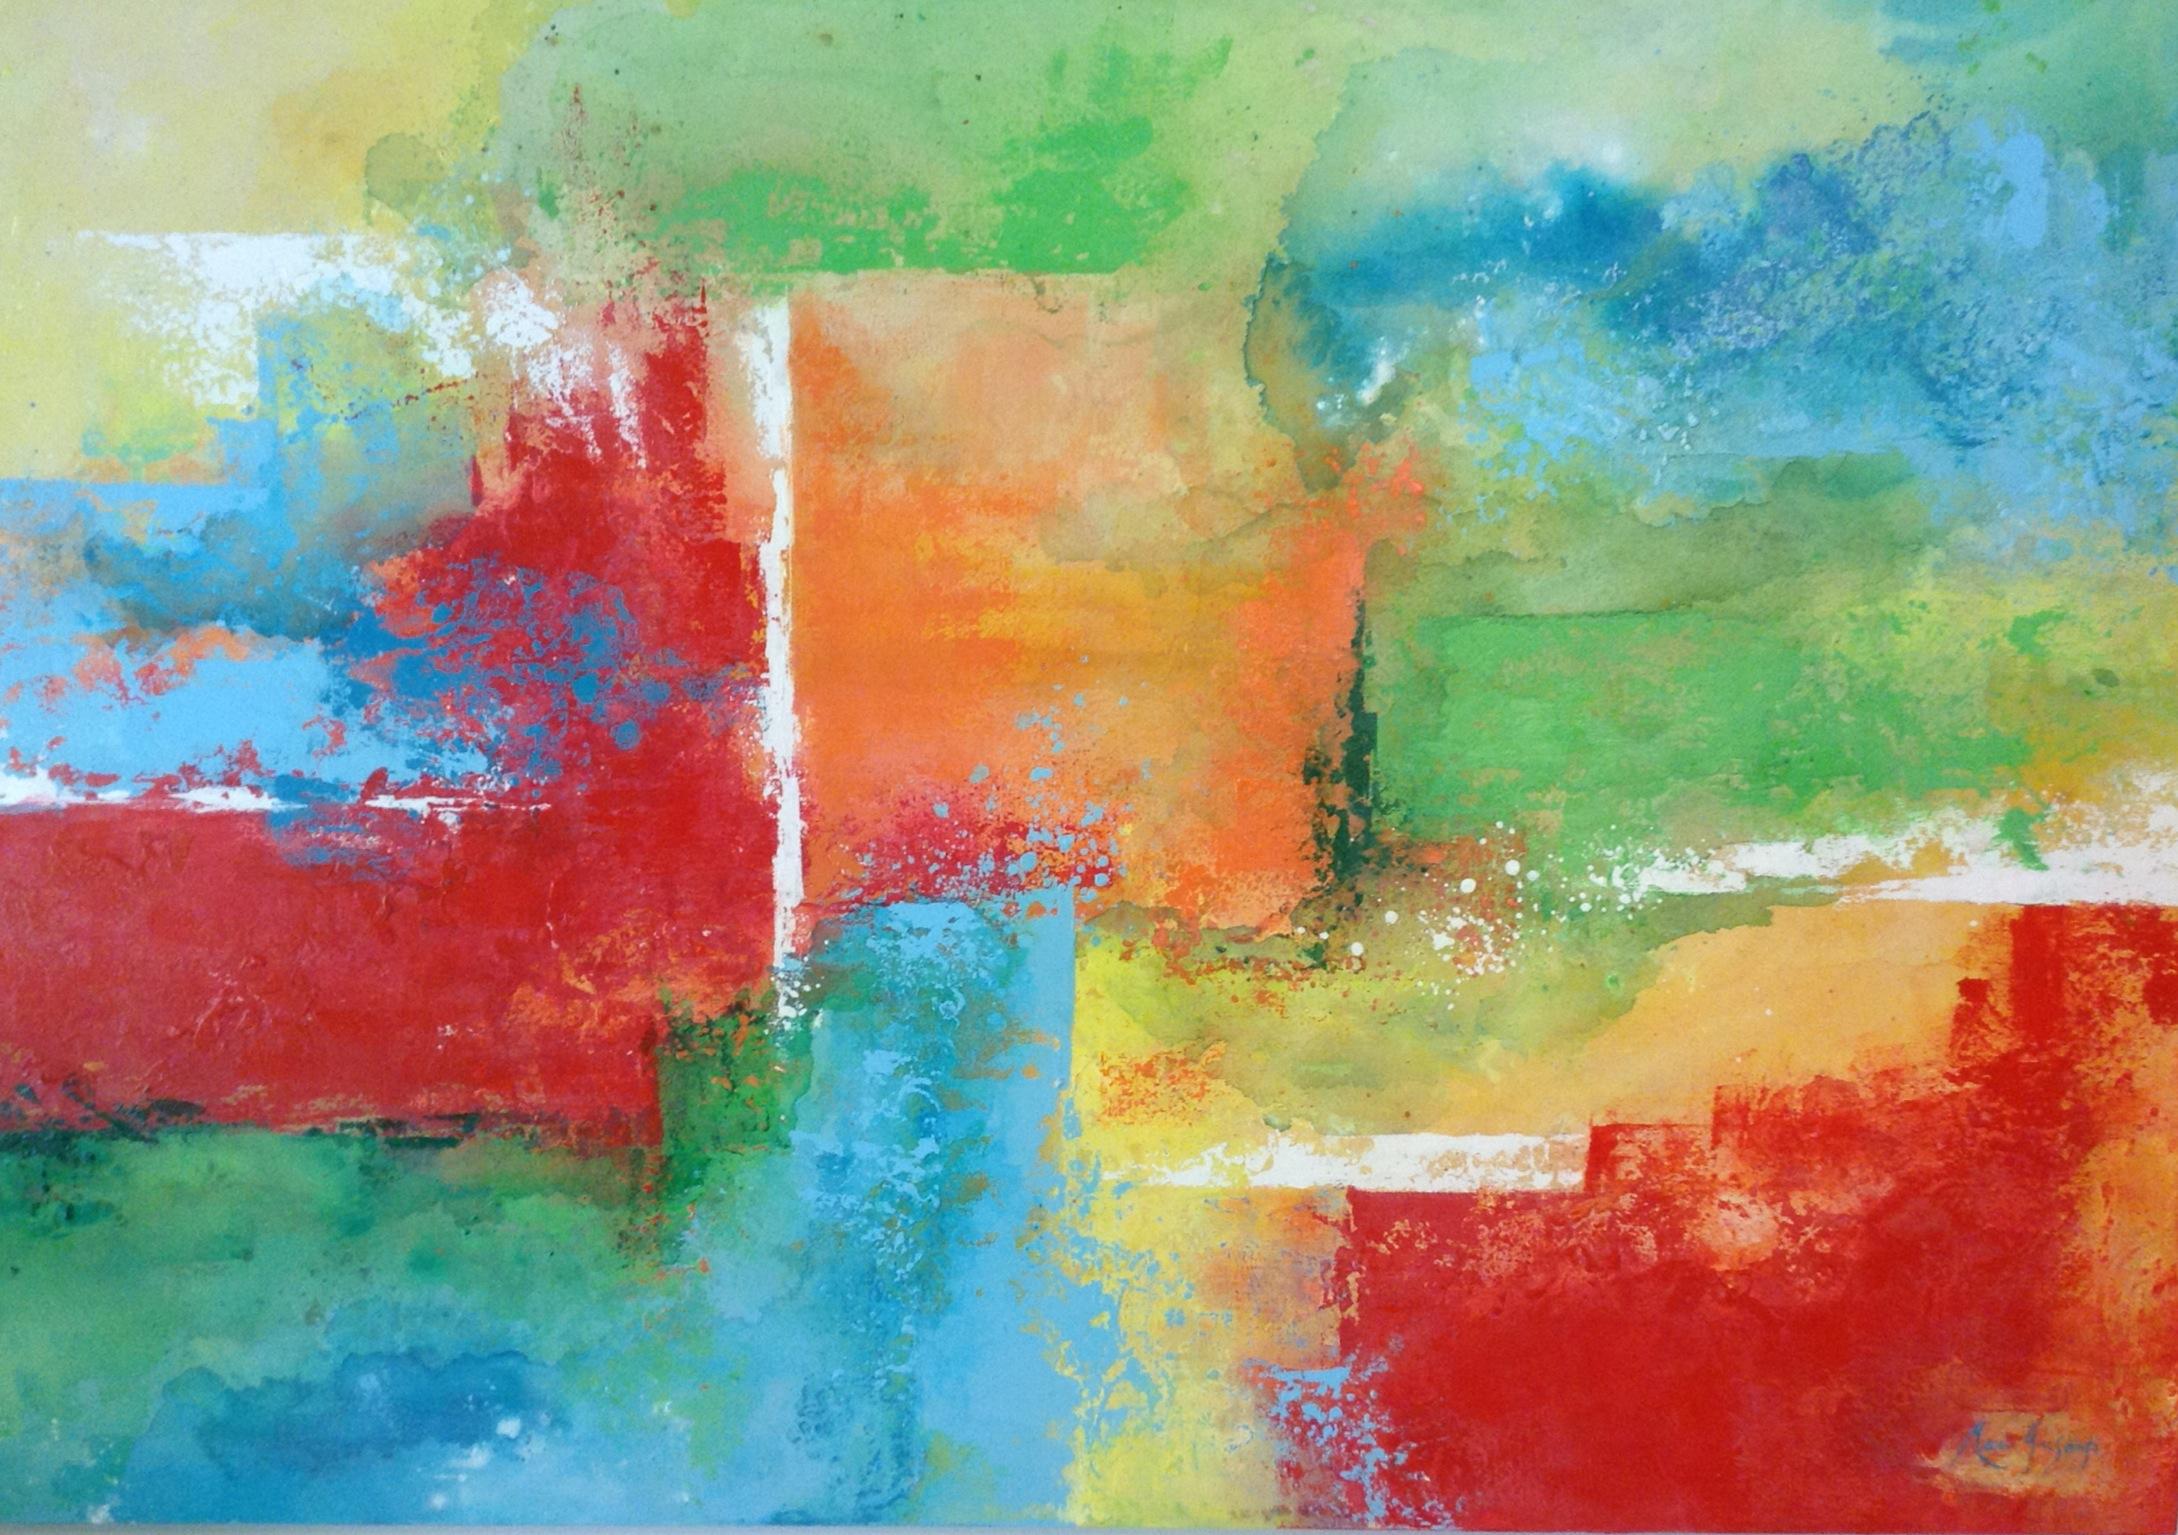 Abstracto 3 120 x 140 cm 2013